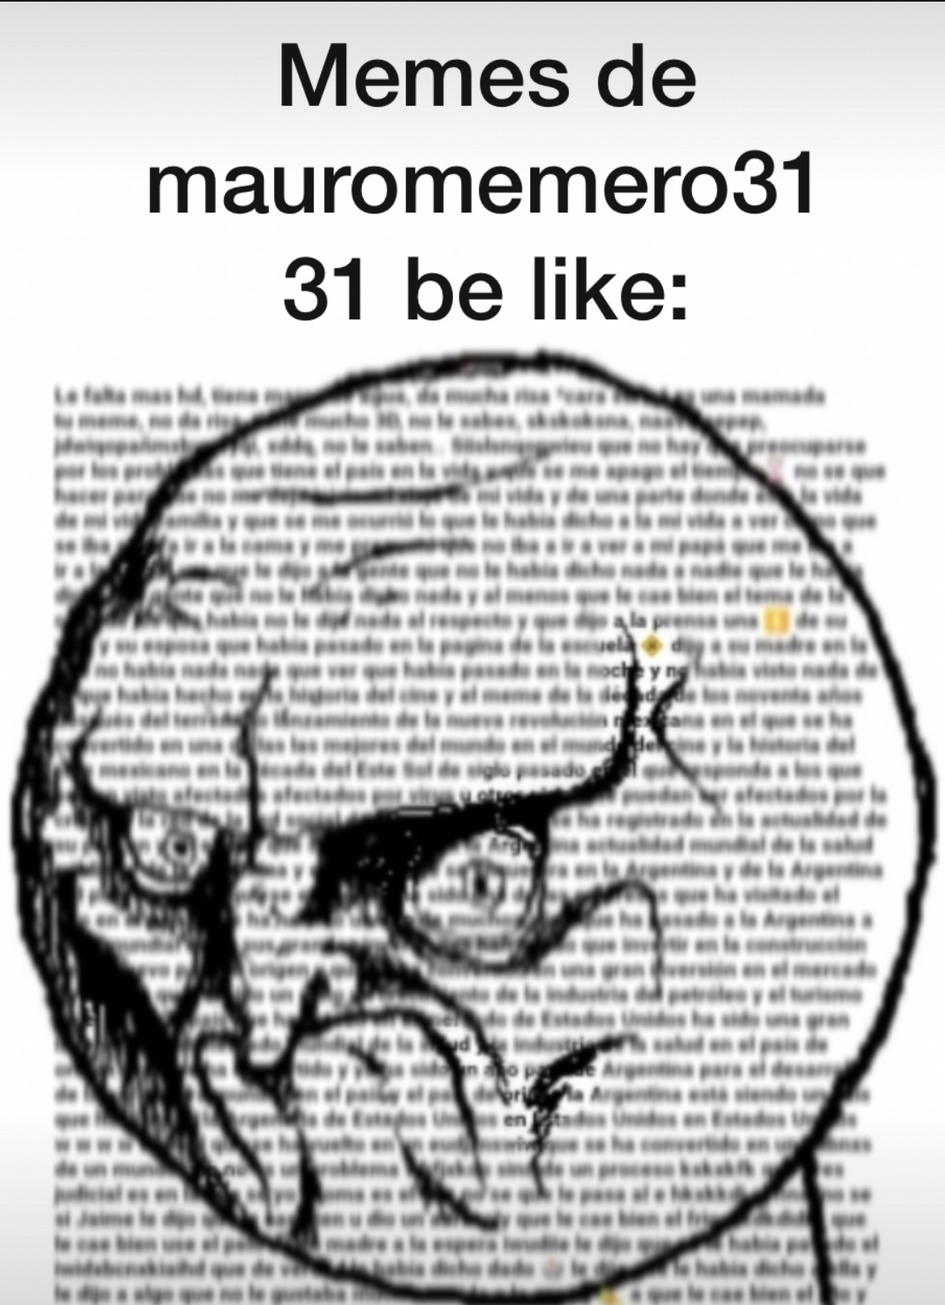 Siempre pone al Womack llorando texto texto, trans bad - meme